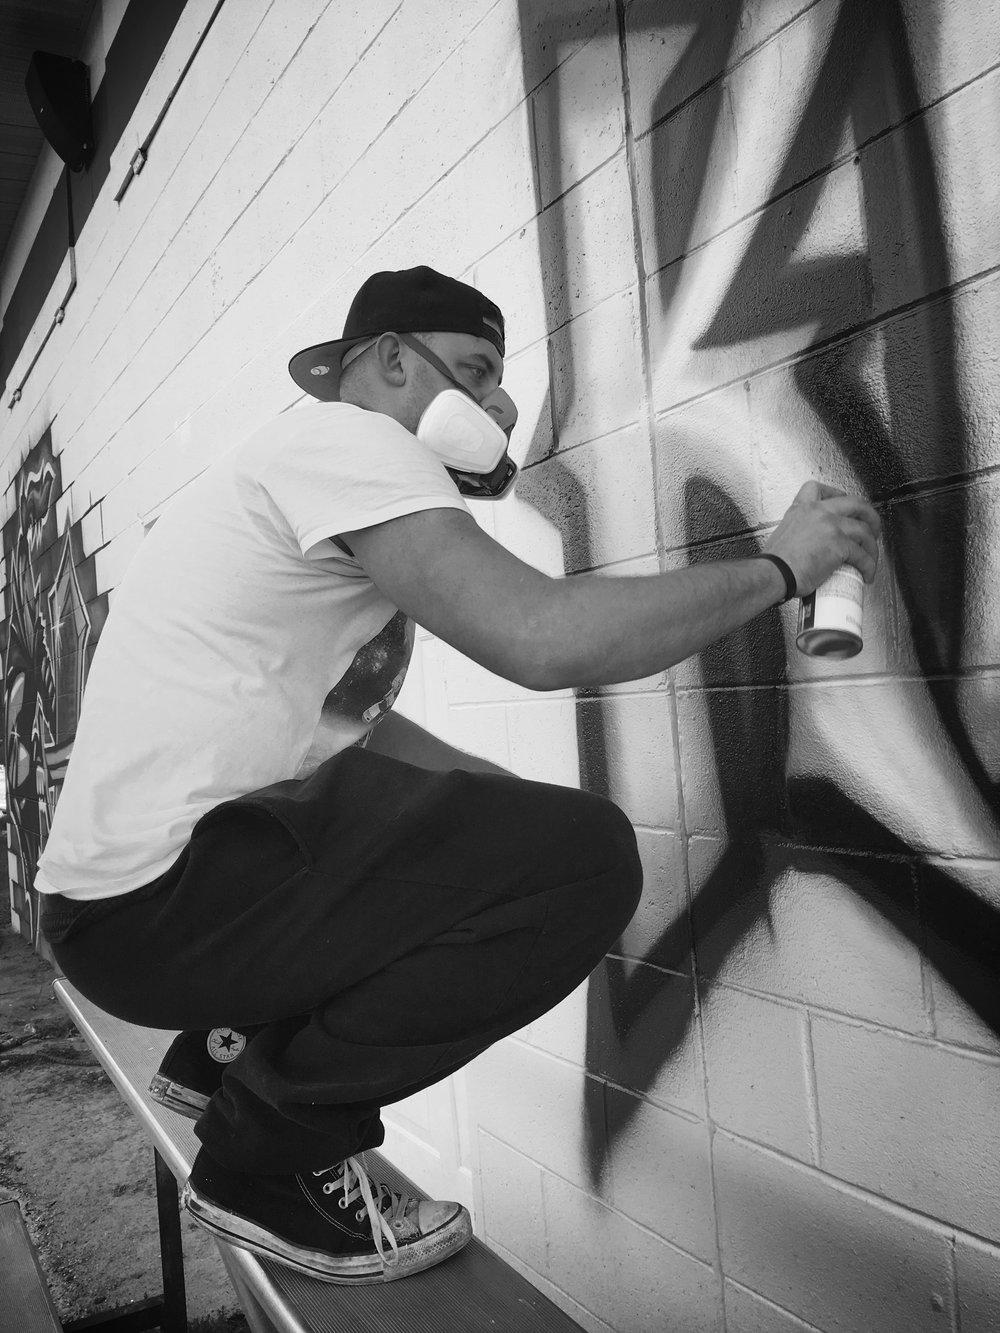 KNEW INK PHILADELPHIA ARTIST